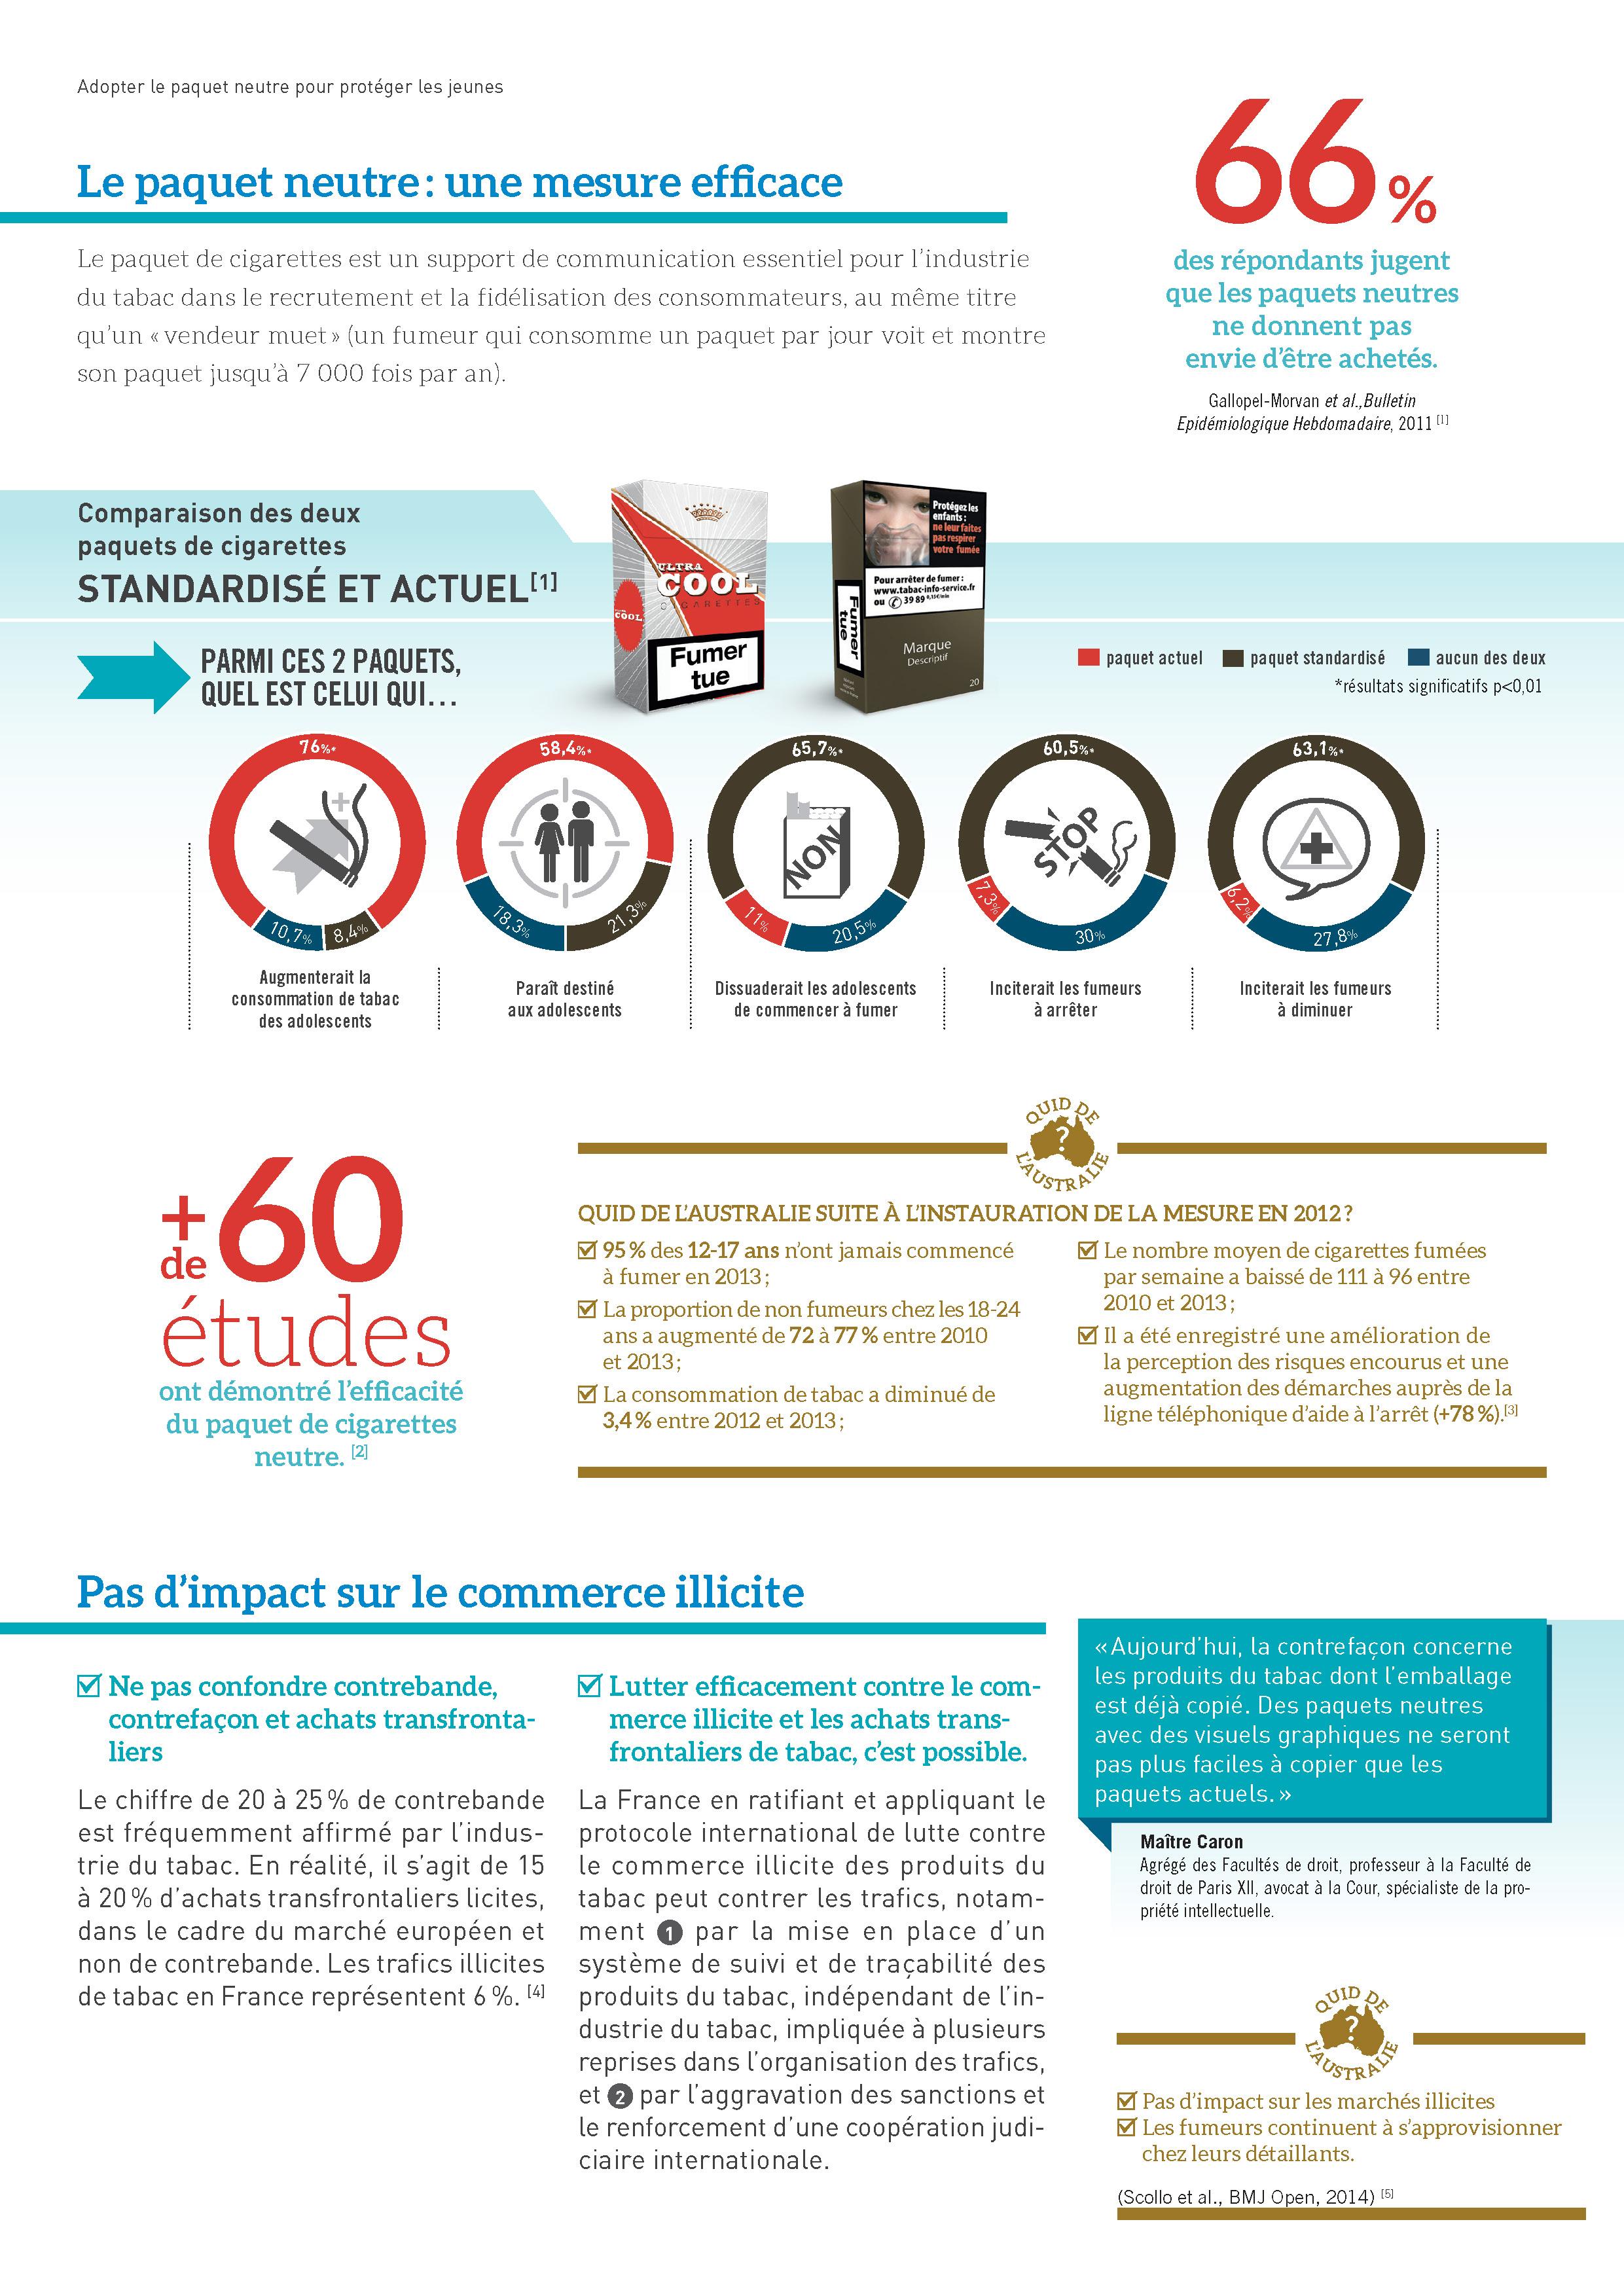 Alliance-DP_journee-mondiale-sans-tabac-avec-annexes-vf-30mai2016_Page_10.jpg